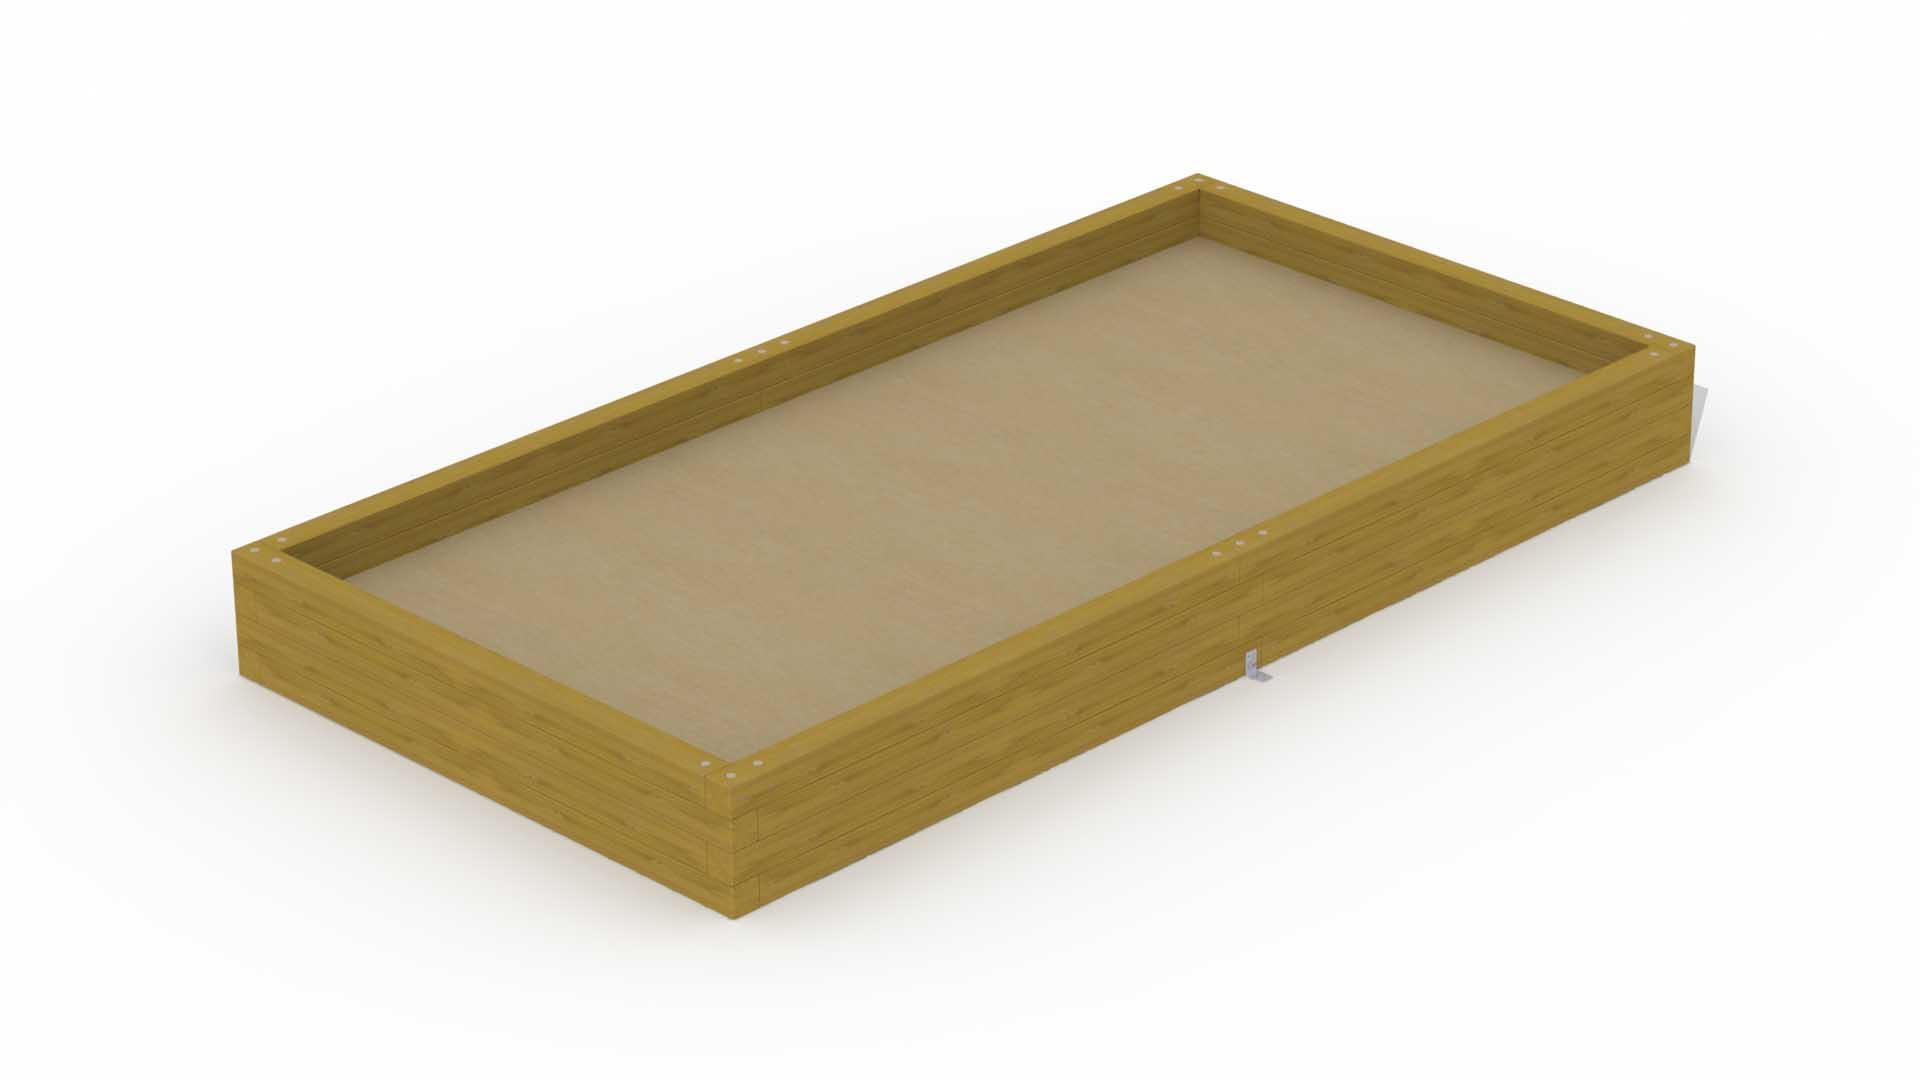 Beam Sandbox (1,8 X 3,6 M)